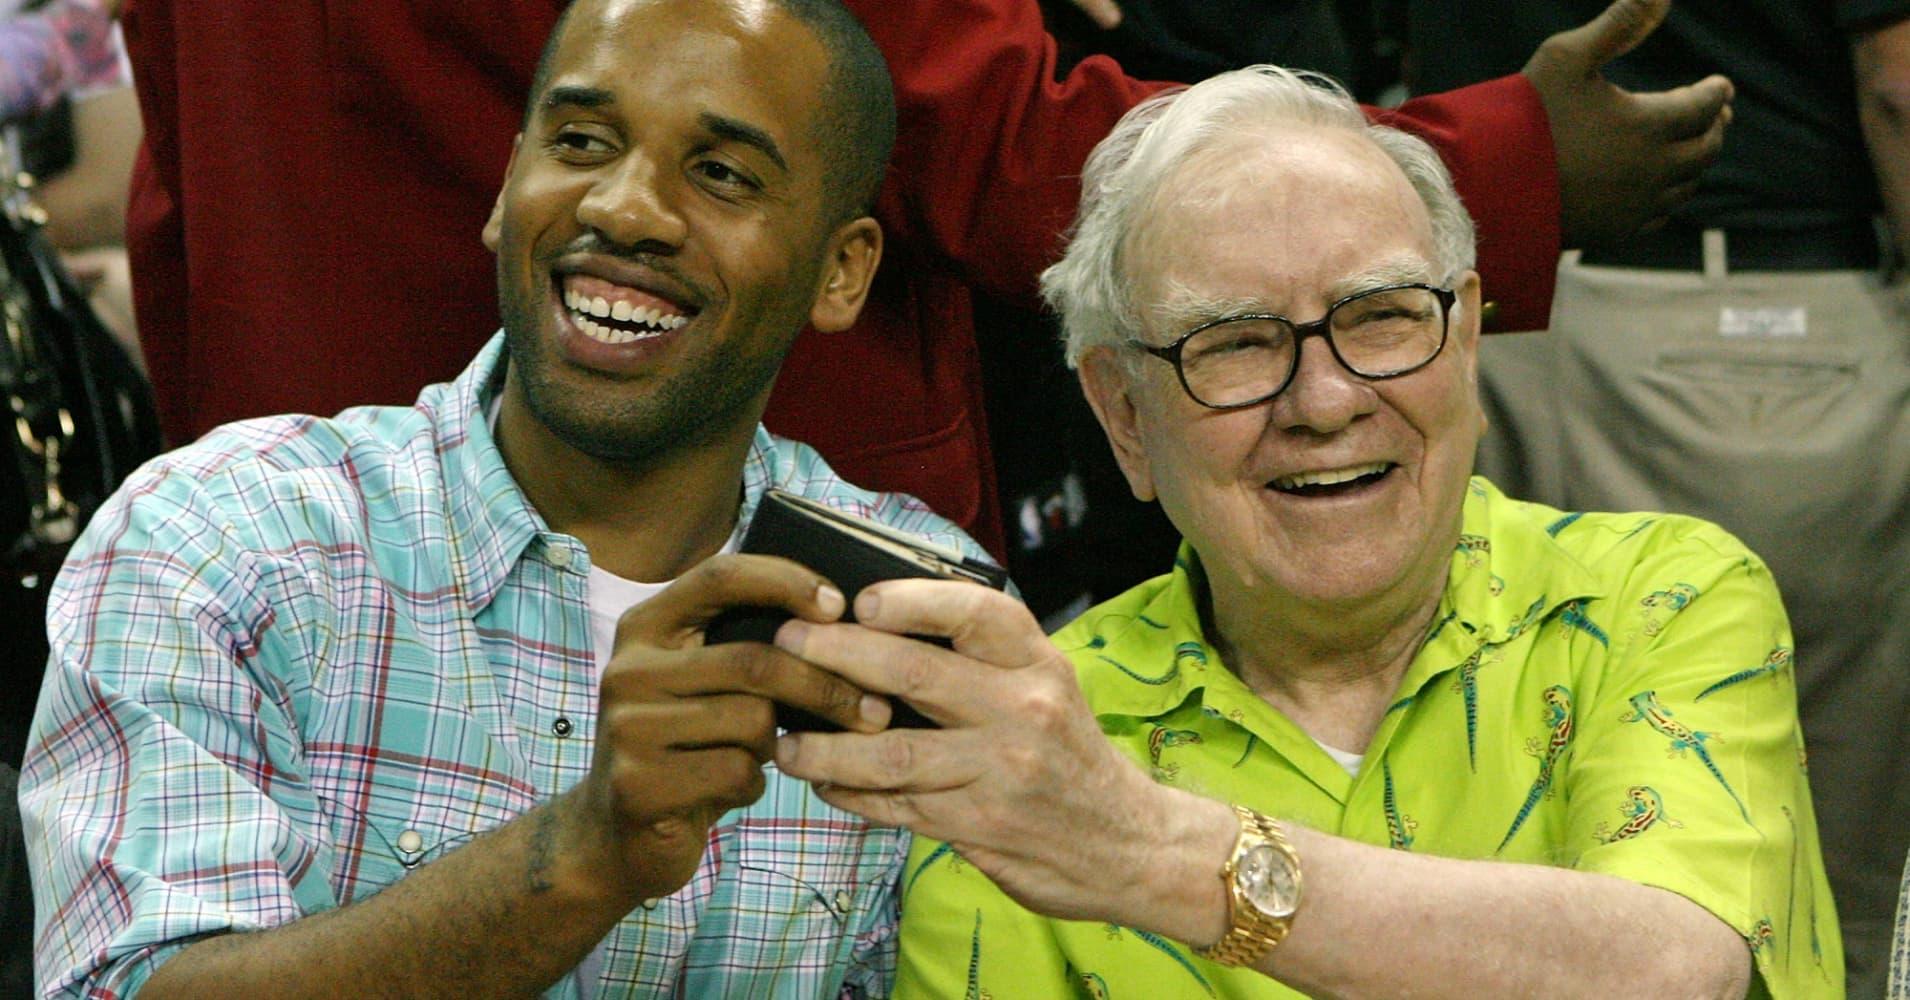 Maverick Carter and Warren Buffett joke around courtside with Buffett's wallet during the 2008 State Farm Basketball Challenge exhibition game.